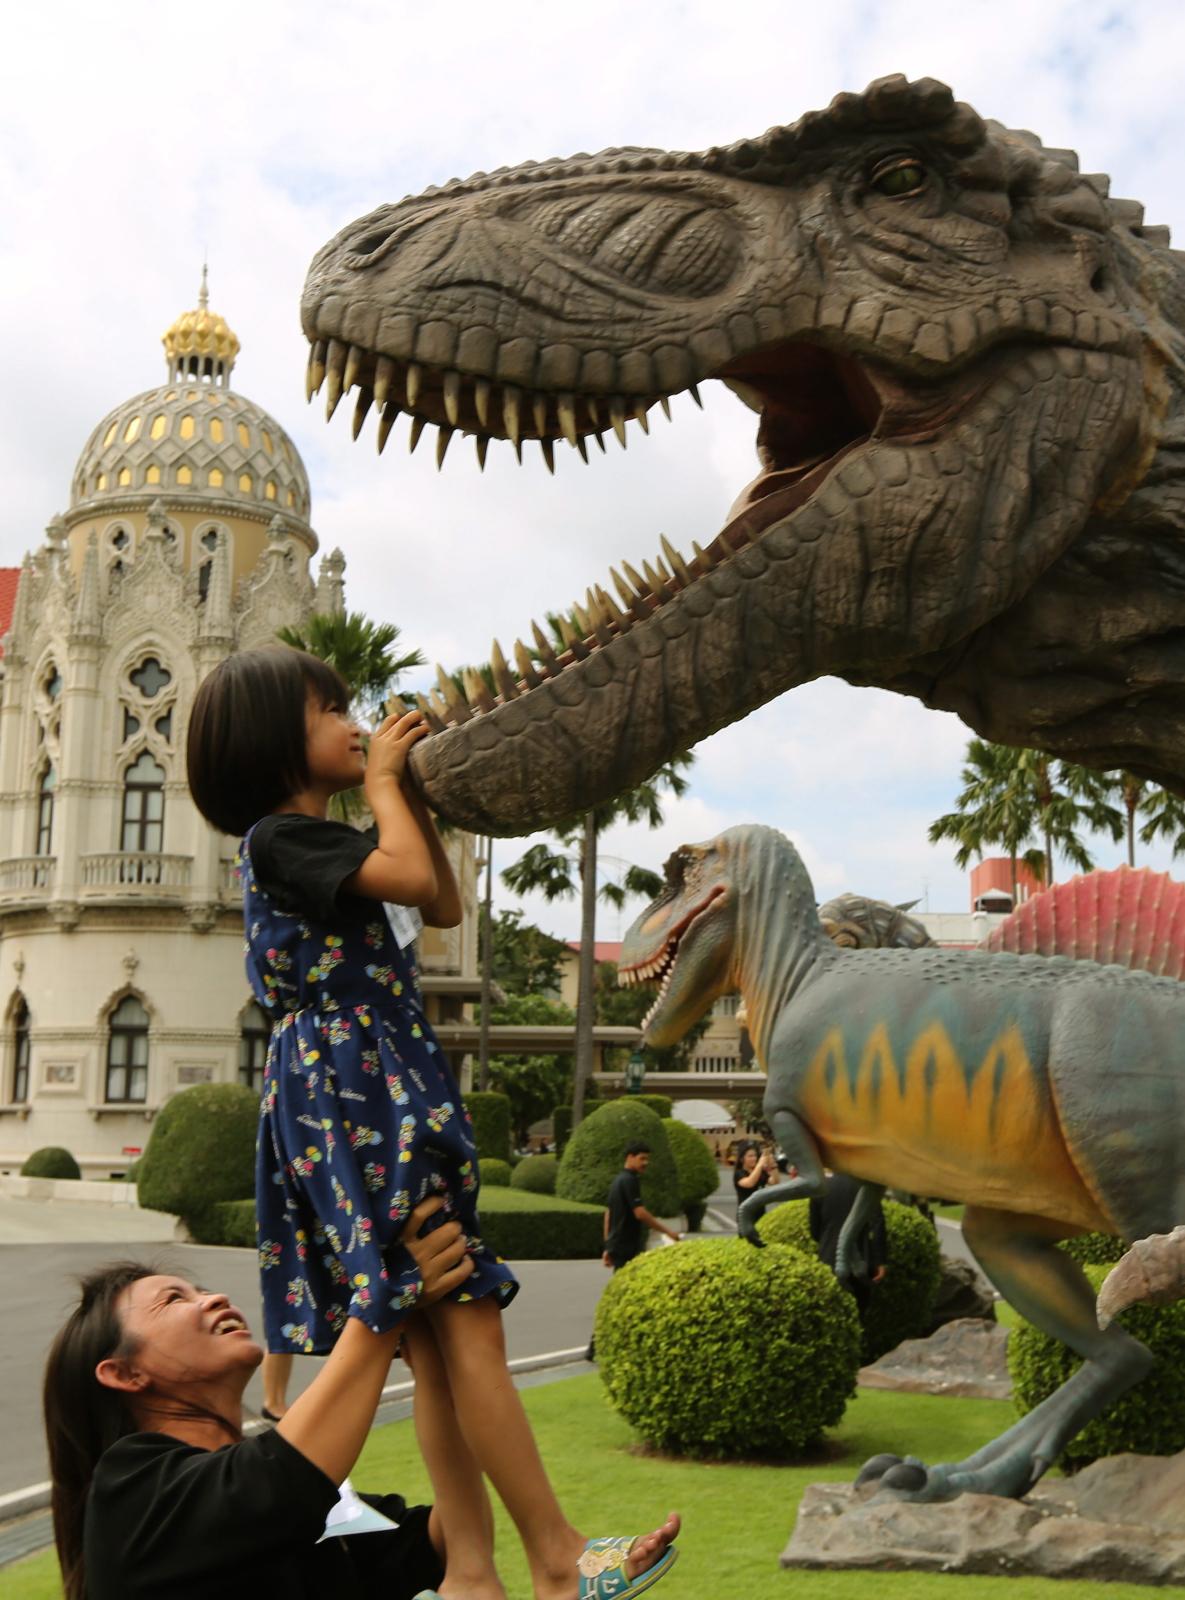 Dzień Dziecka w Tajlandii.  Fot. PAP/EPA/NARONG SANGNAK